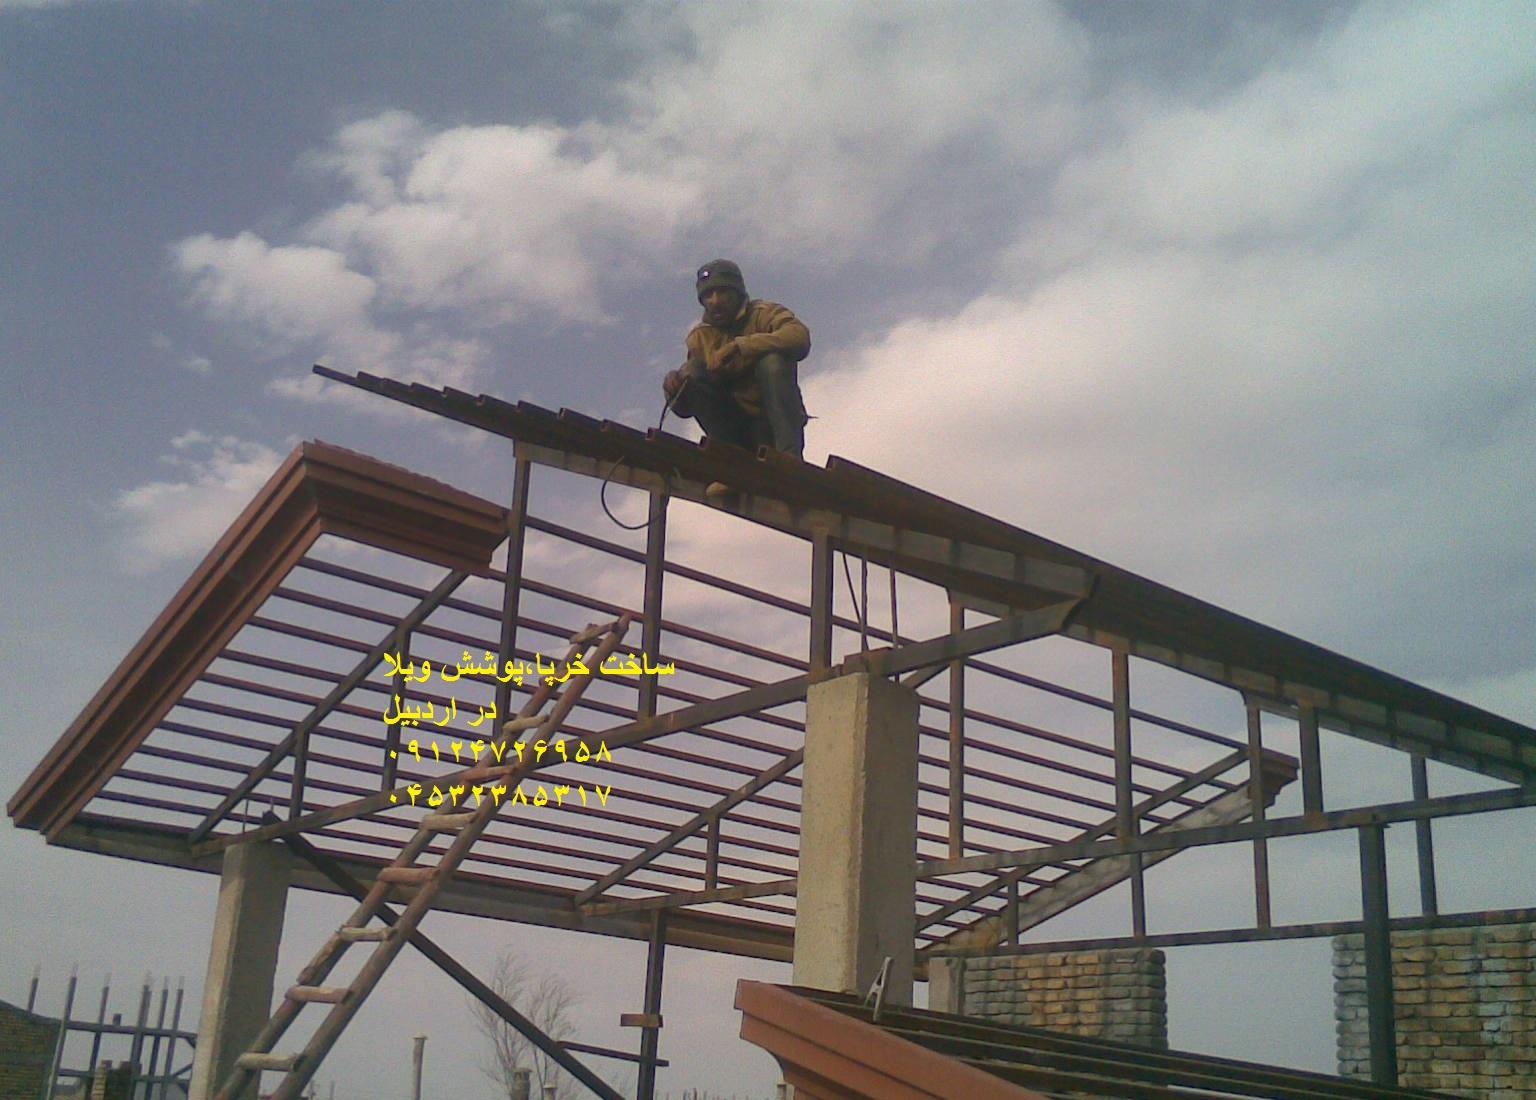 سقف ویلا اردبیل_09124726958